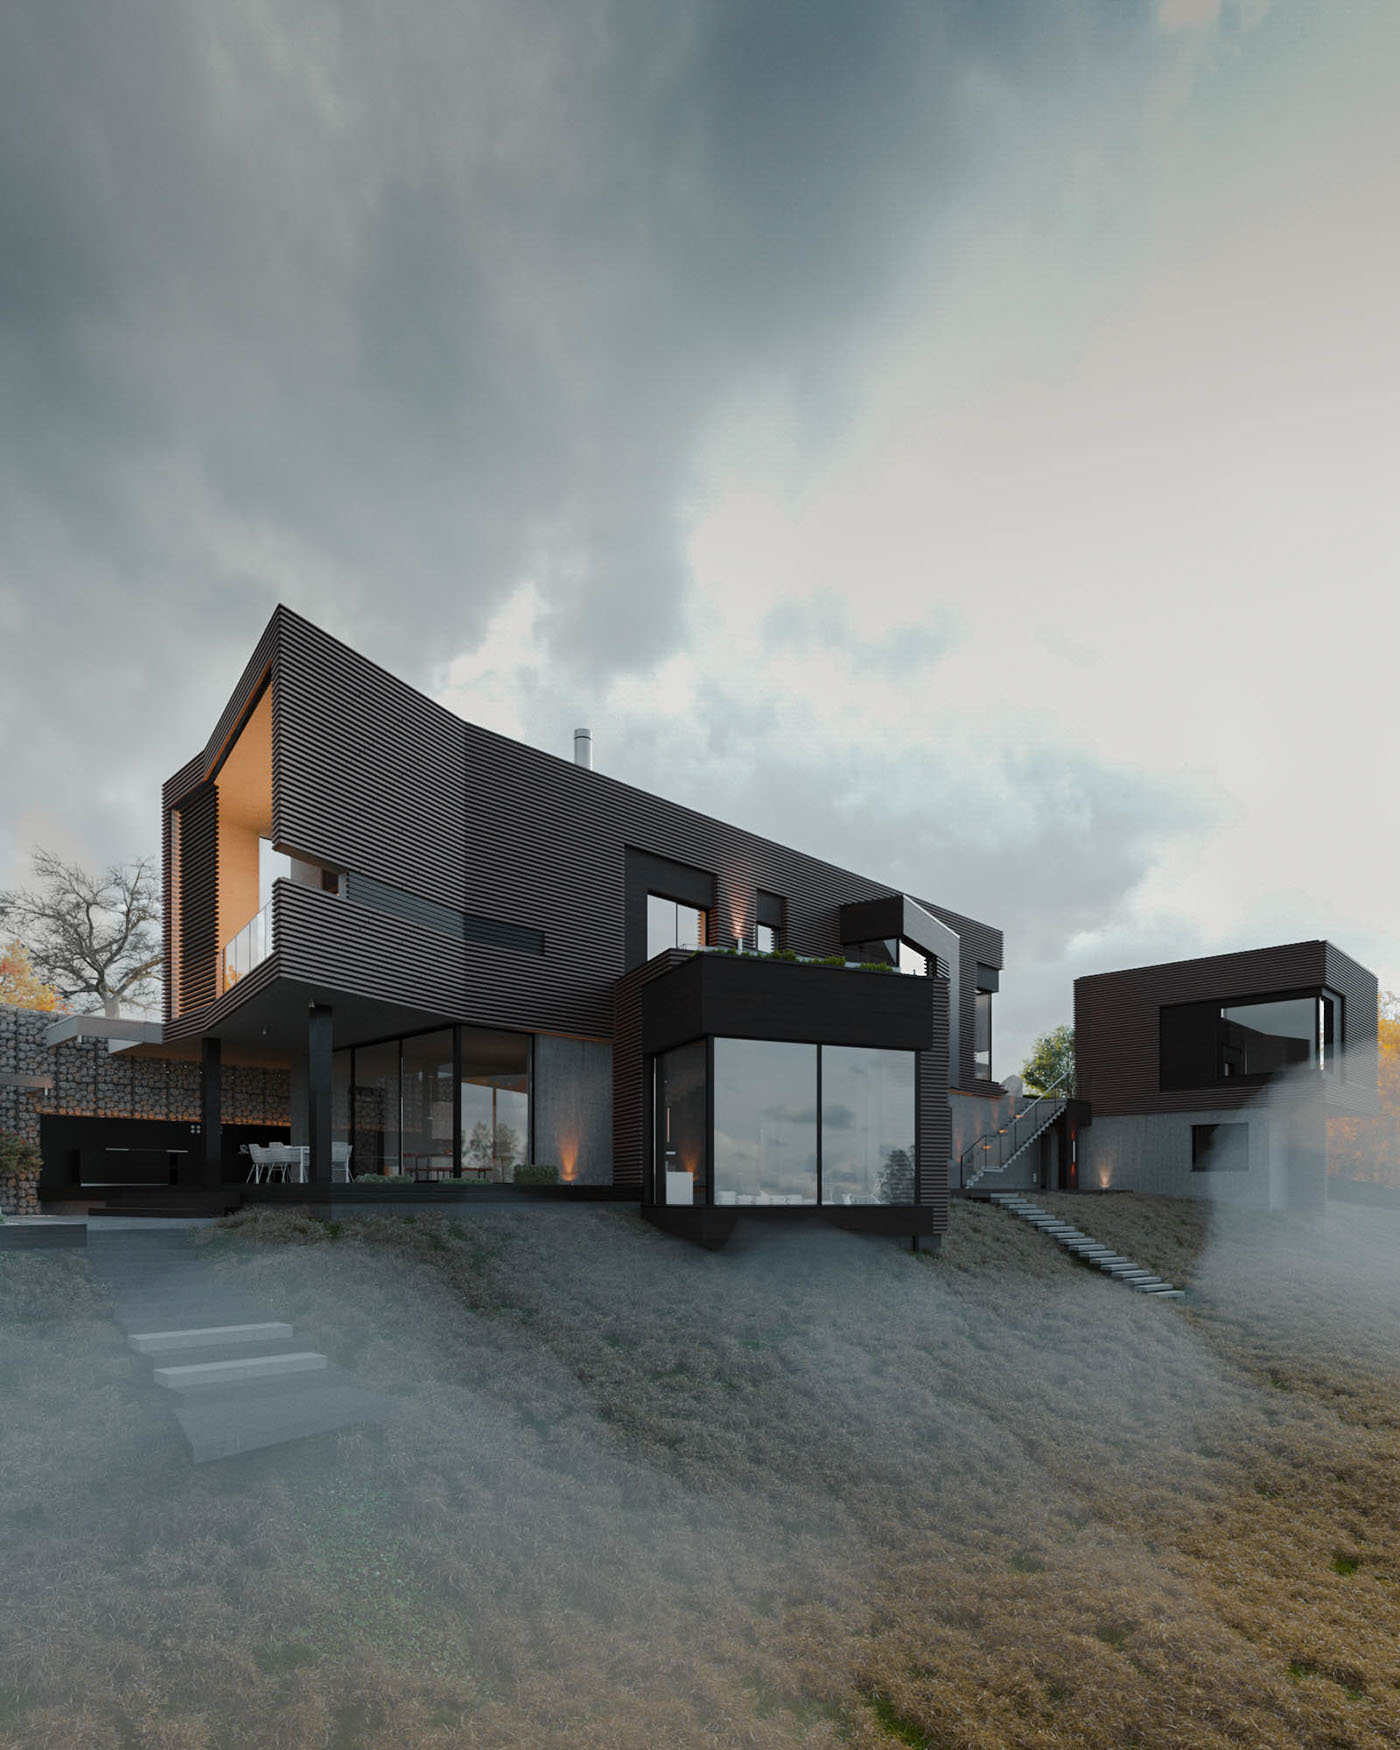 architecture Greyness Cottage atmospheric fog Render